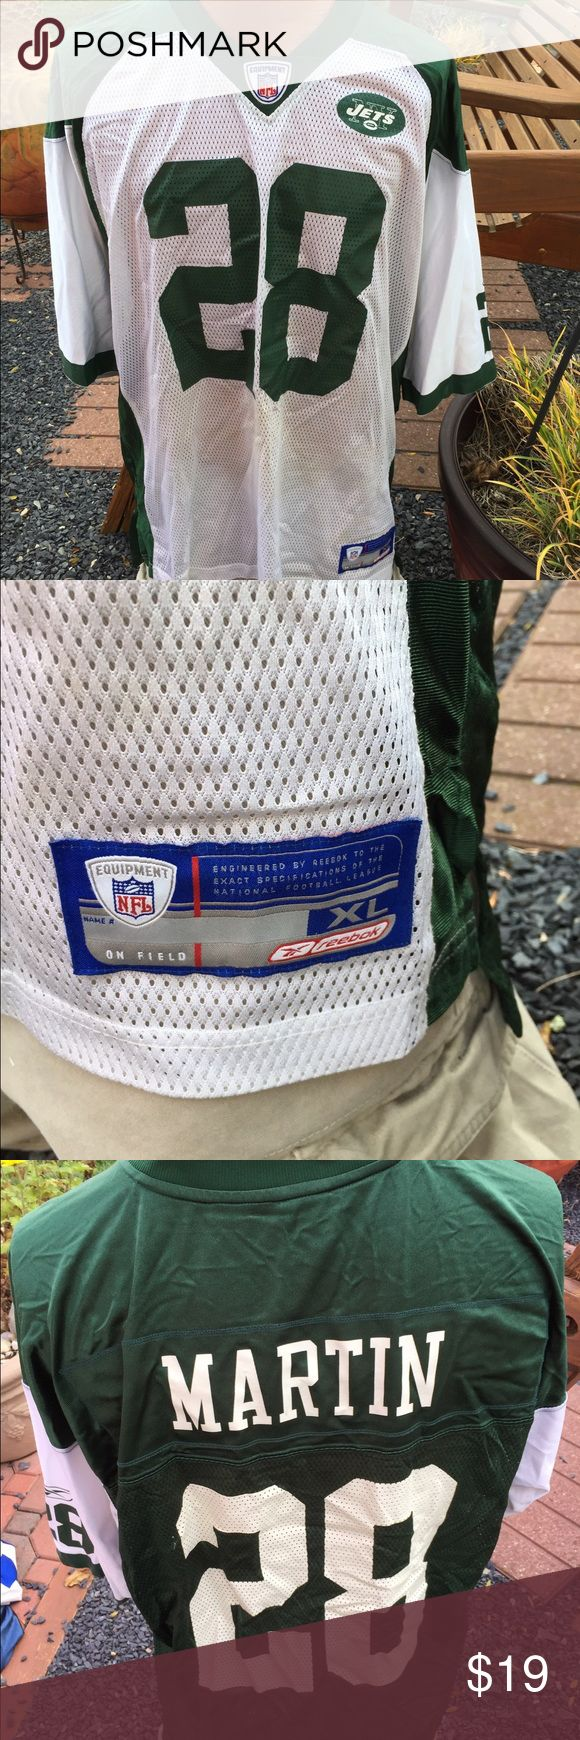 Reebok New York Jets Curtis Martin Jersey Size XL Size XL. Gently preowned Reebok Shirts